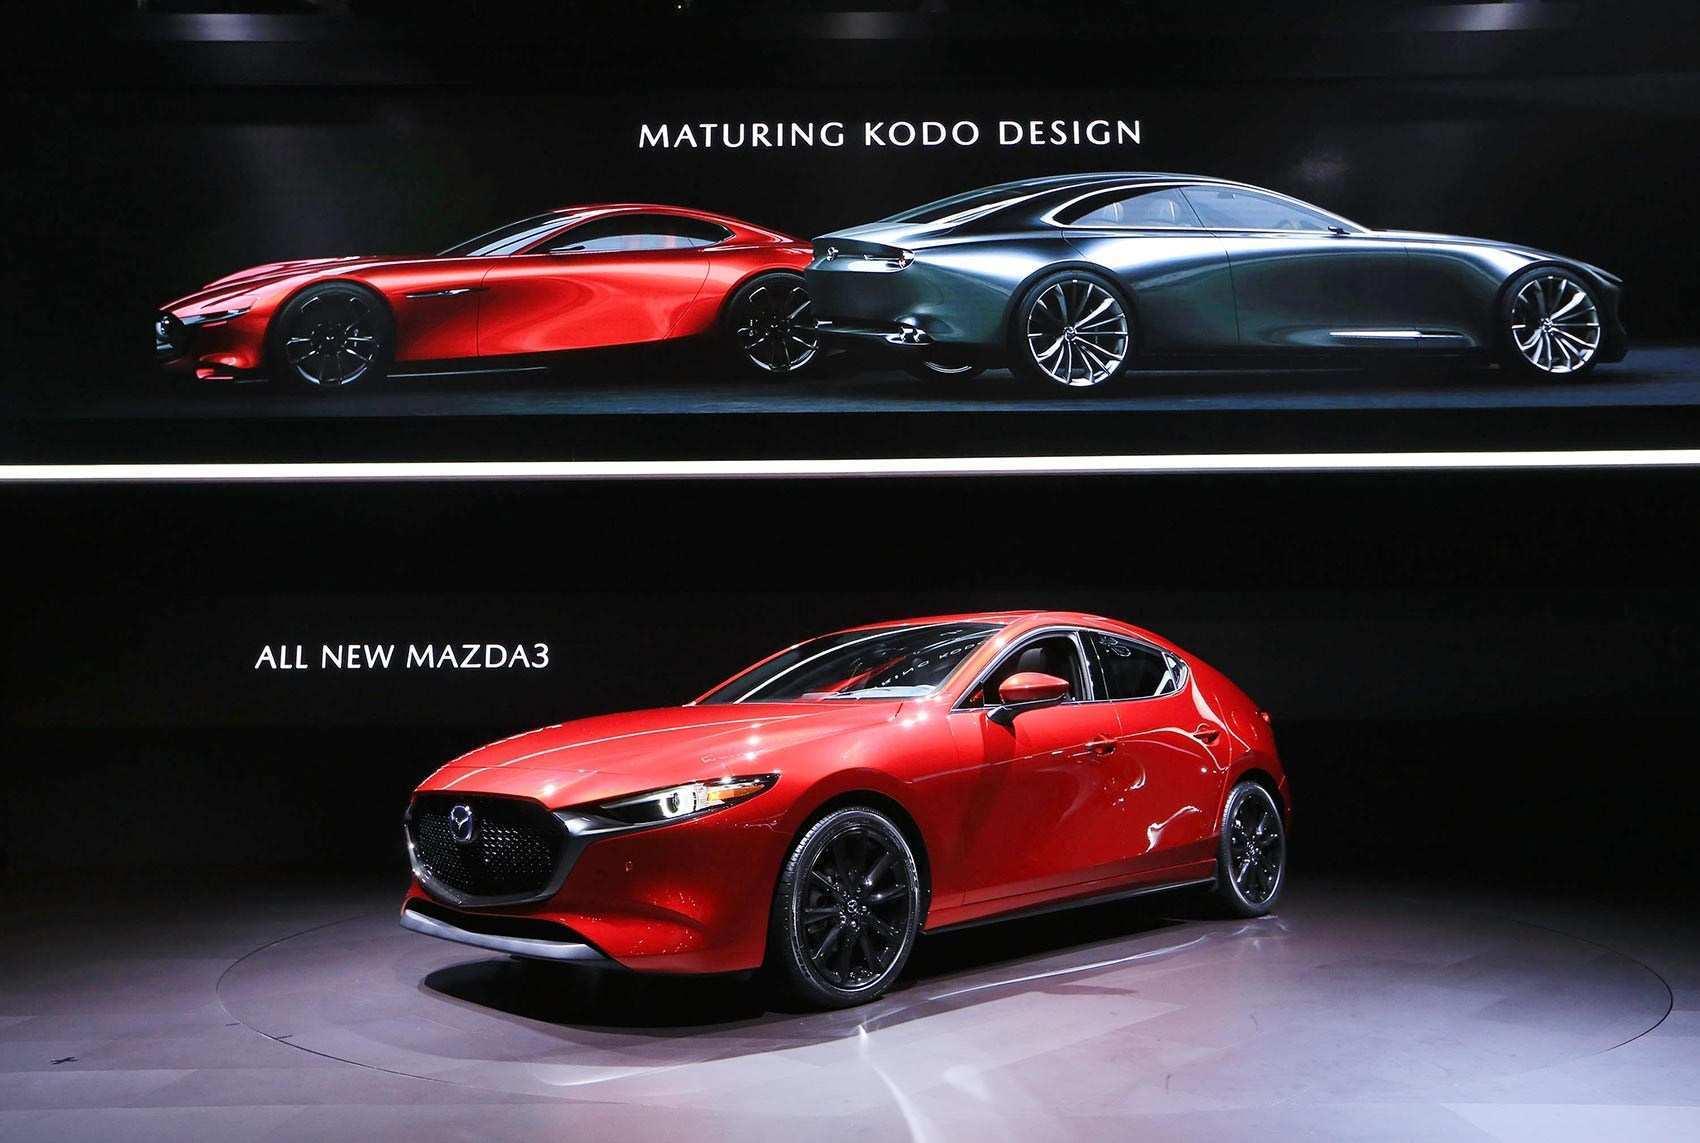 23 New New Mazda 3 2019 Spy Interior Review with New Mazda 3 2019 Spy Interior